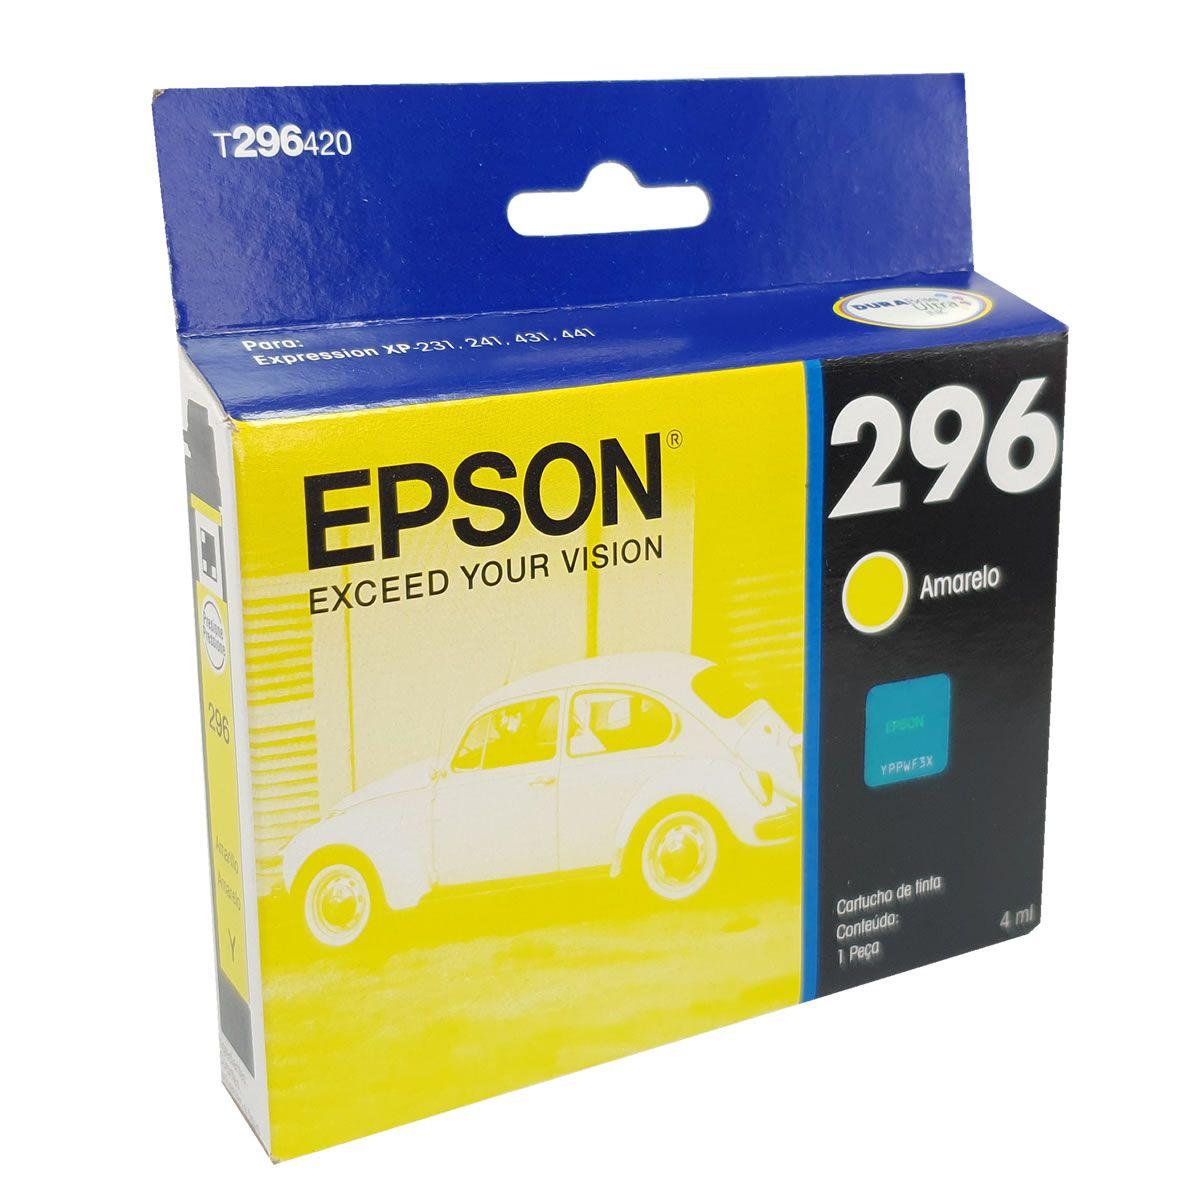 Cartucho EPSON 296 T296420 Amarelo para XP-231 431 T296 TO296 T0296